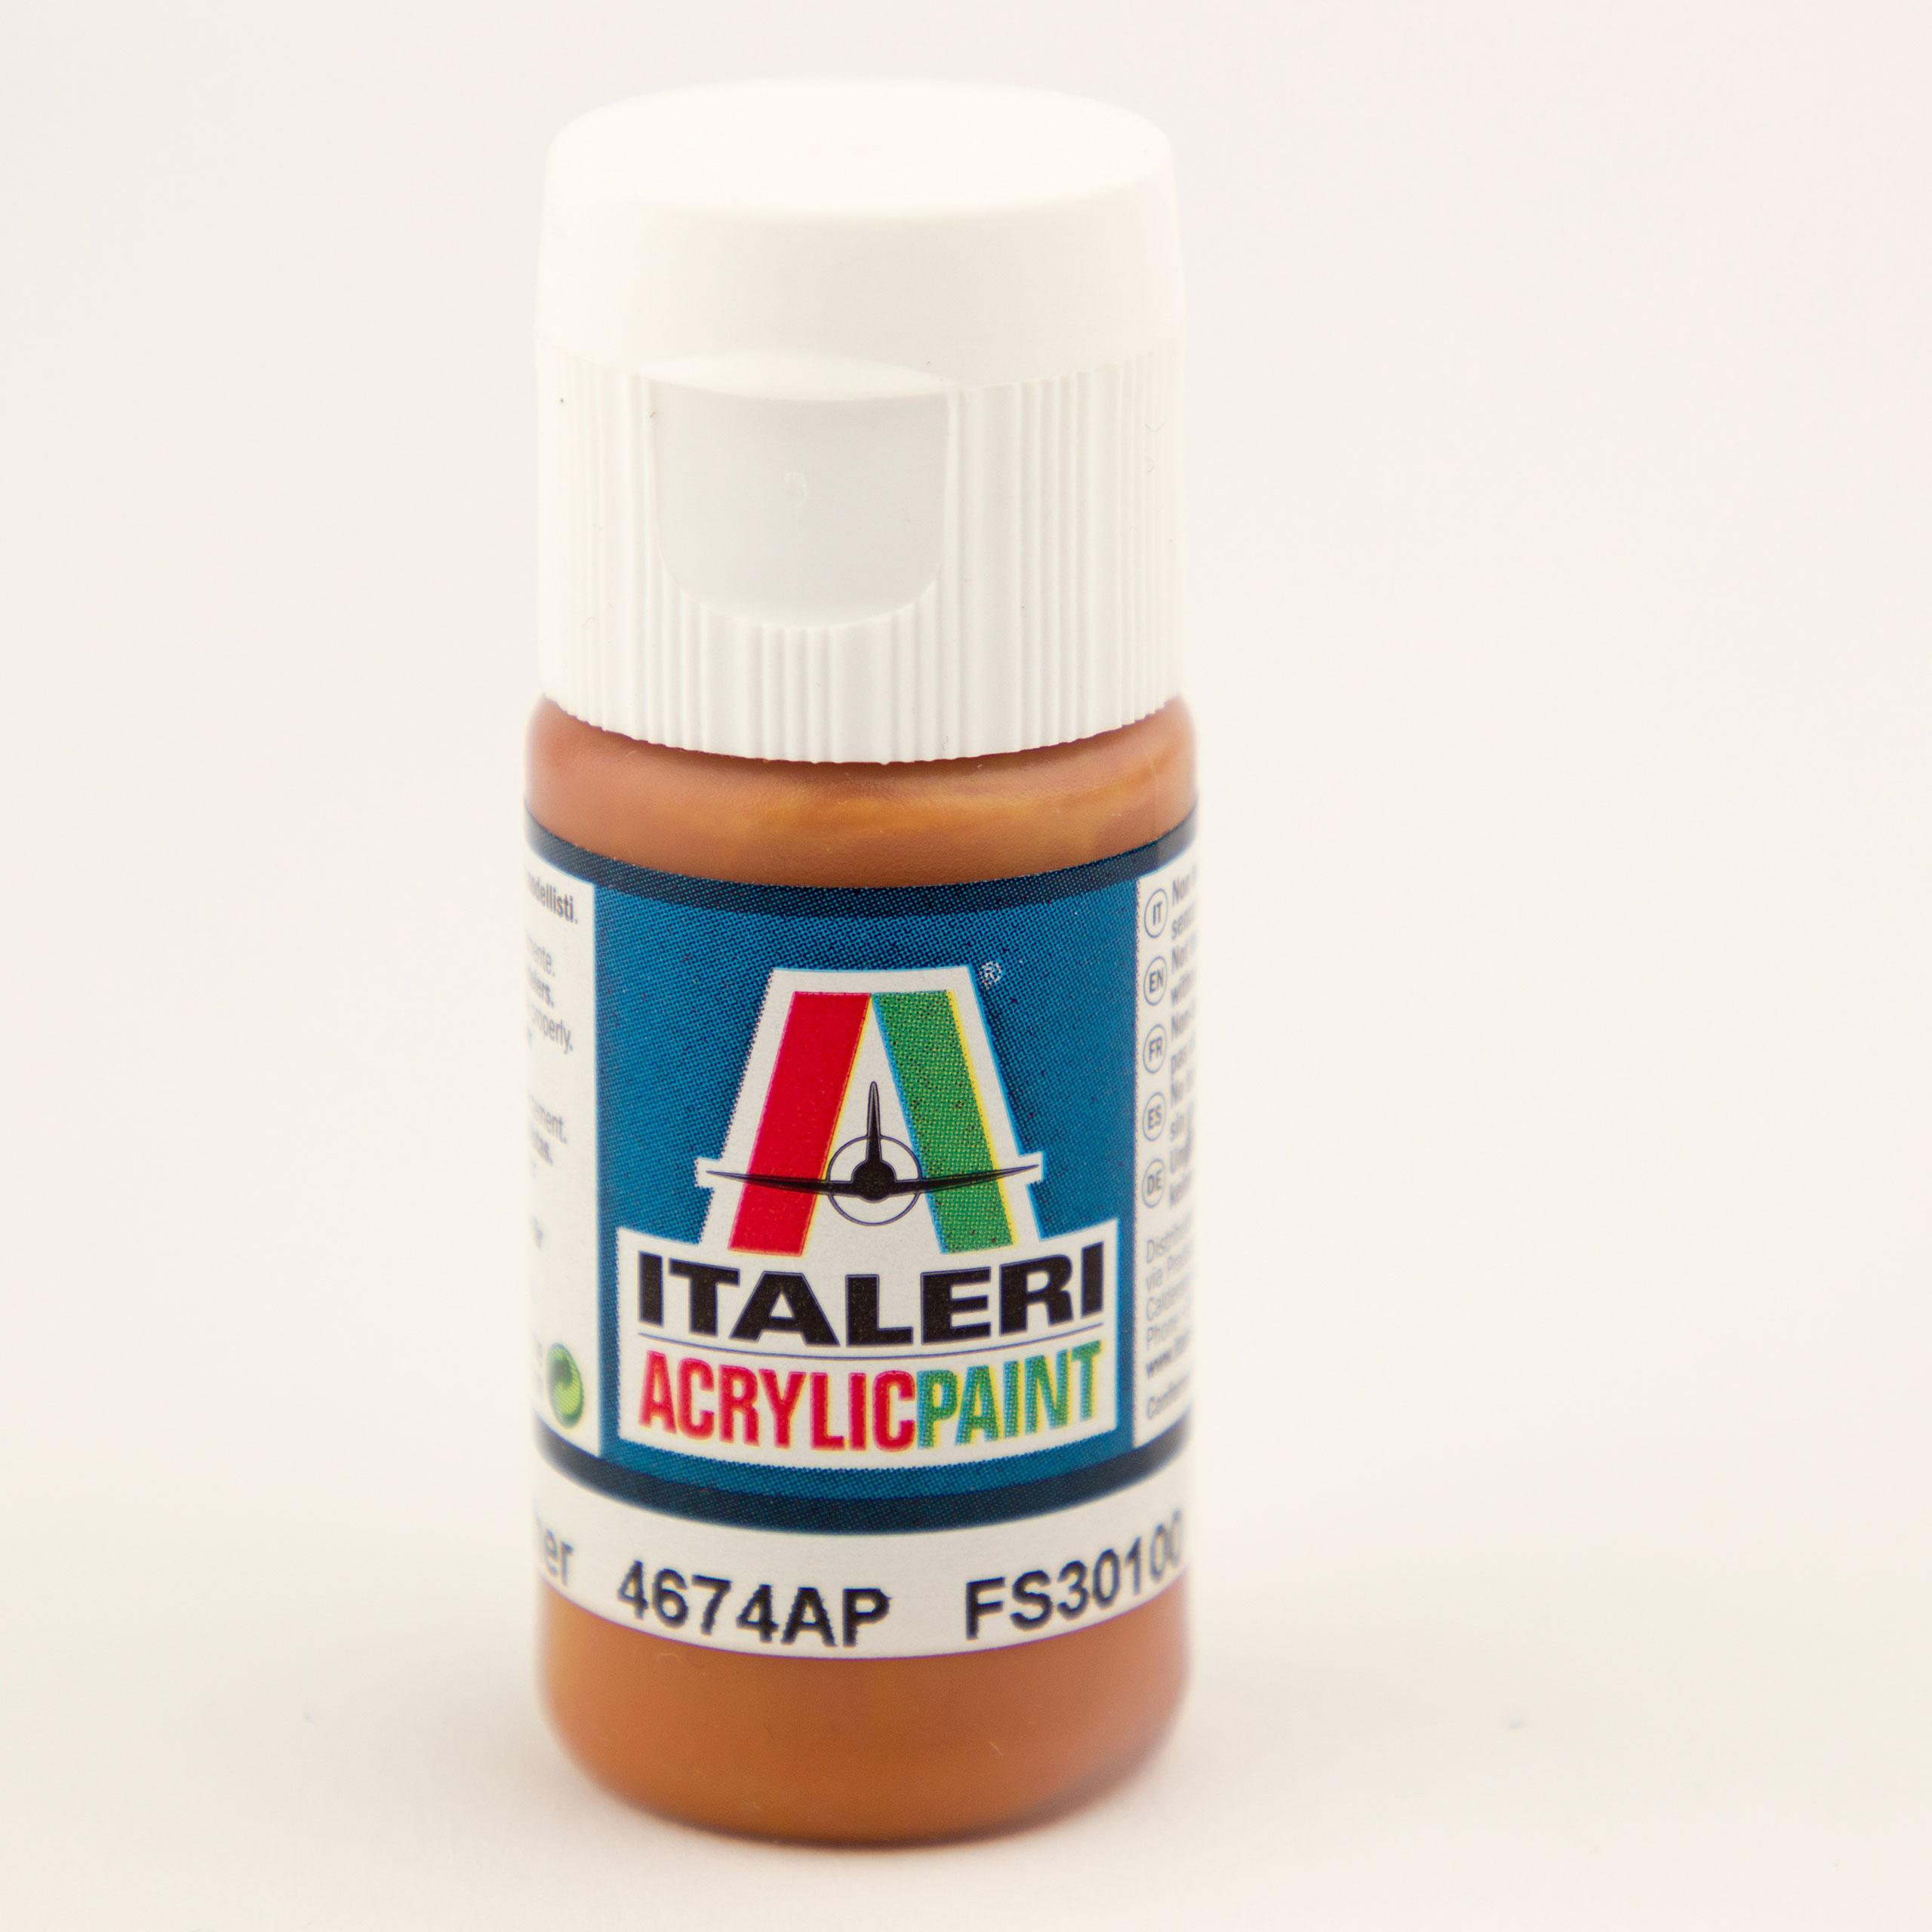 Italeri IT Acrylfarbe 4674 Leder matt 20 ml Airbrush Farbe